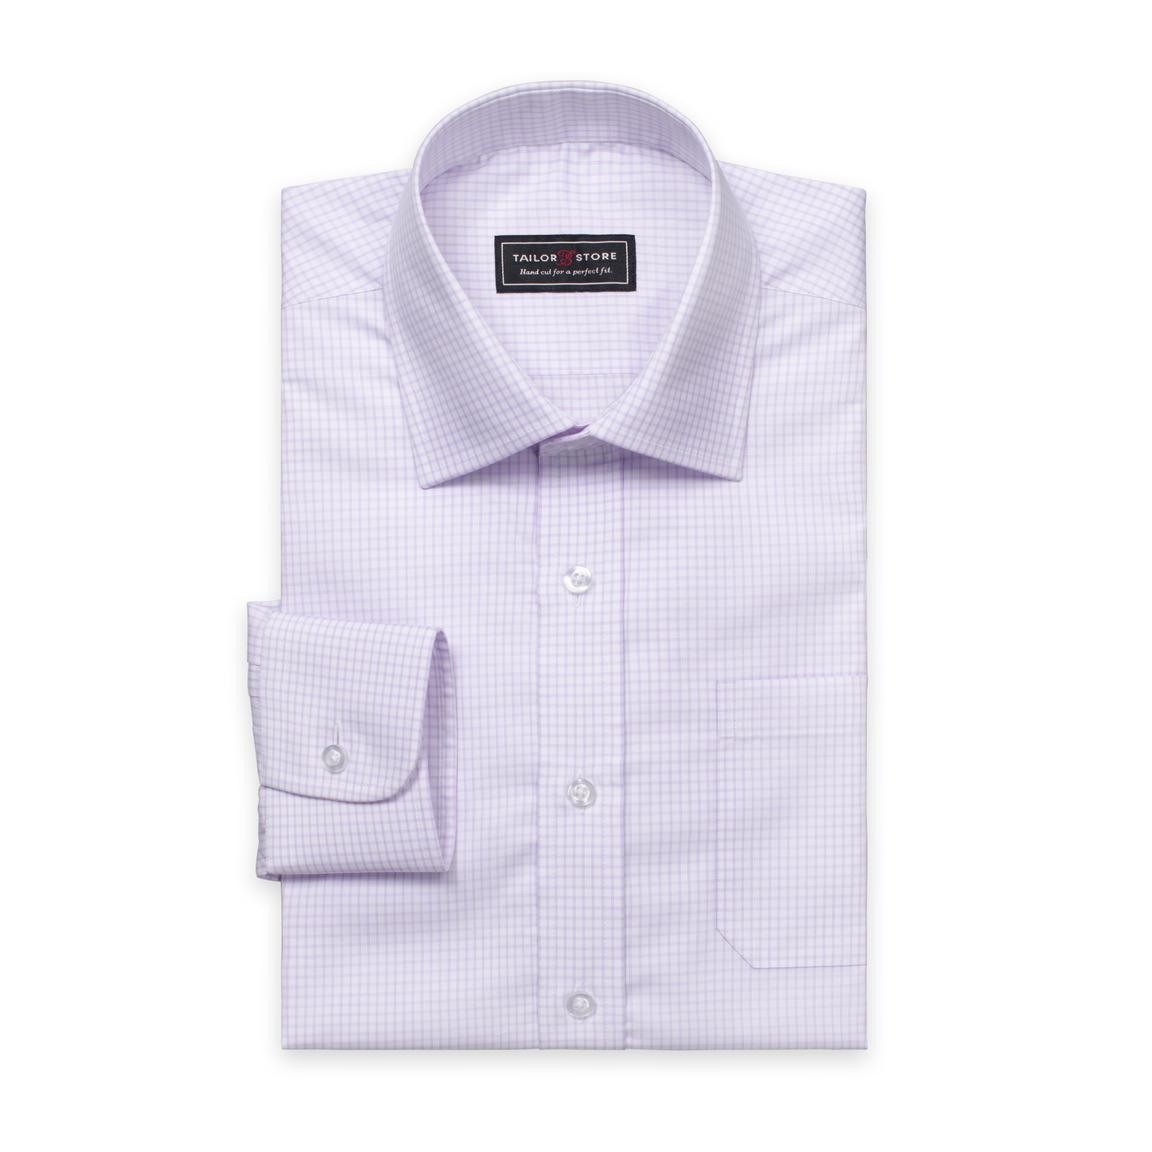 White/Light purple checked twill shirt